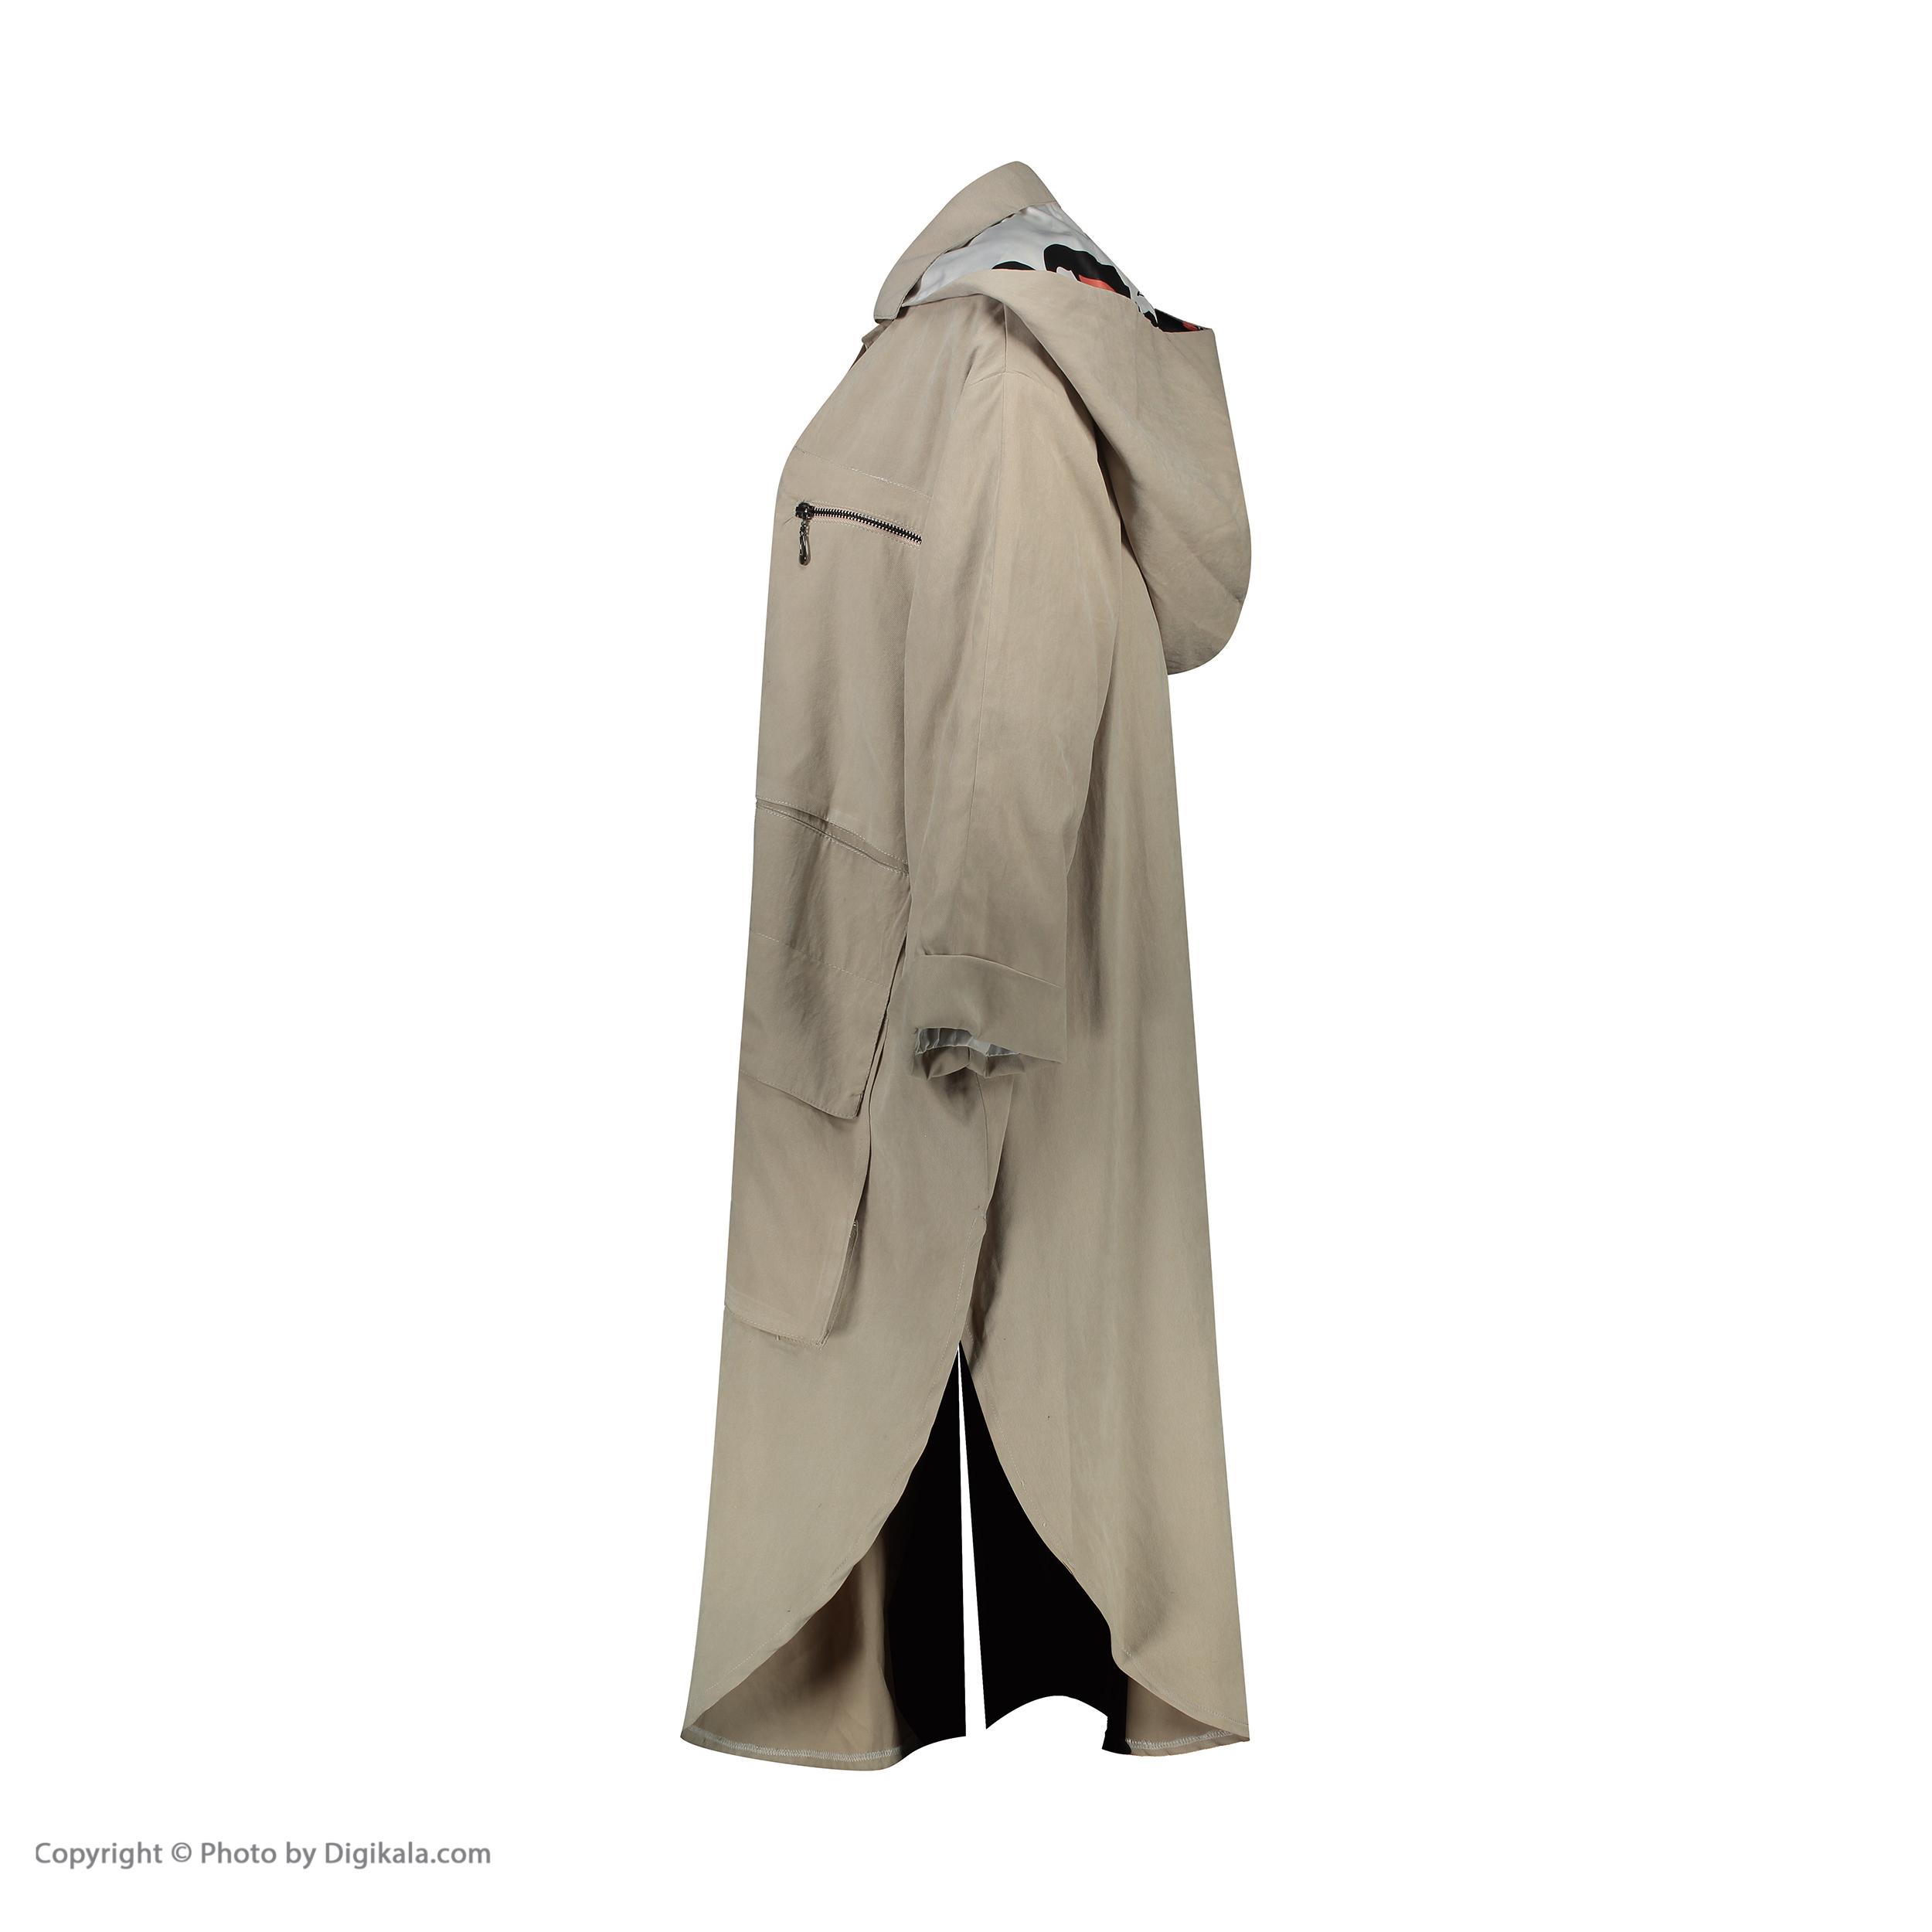 کاپشن زنانه وینکلر مدل W0614011RC